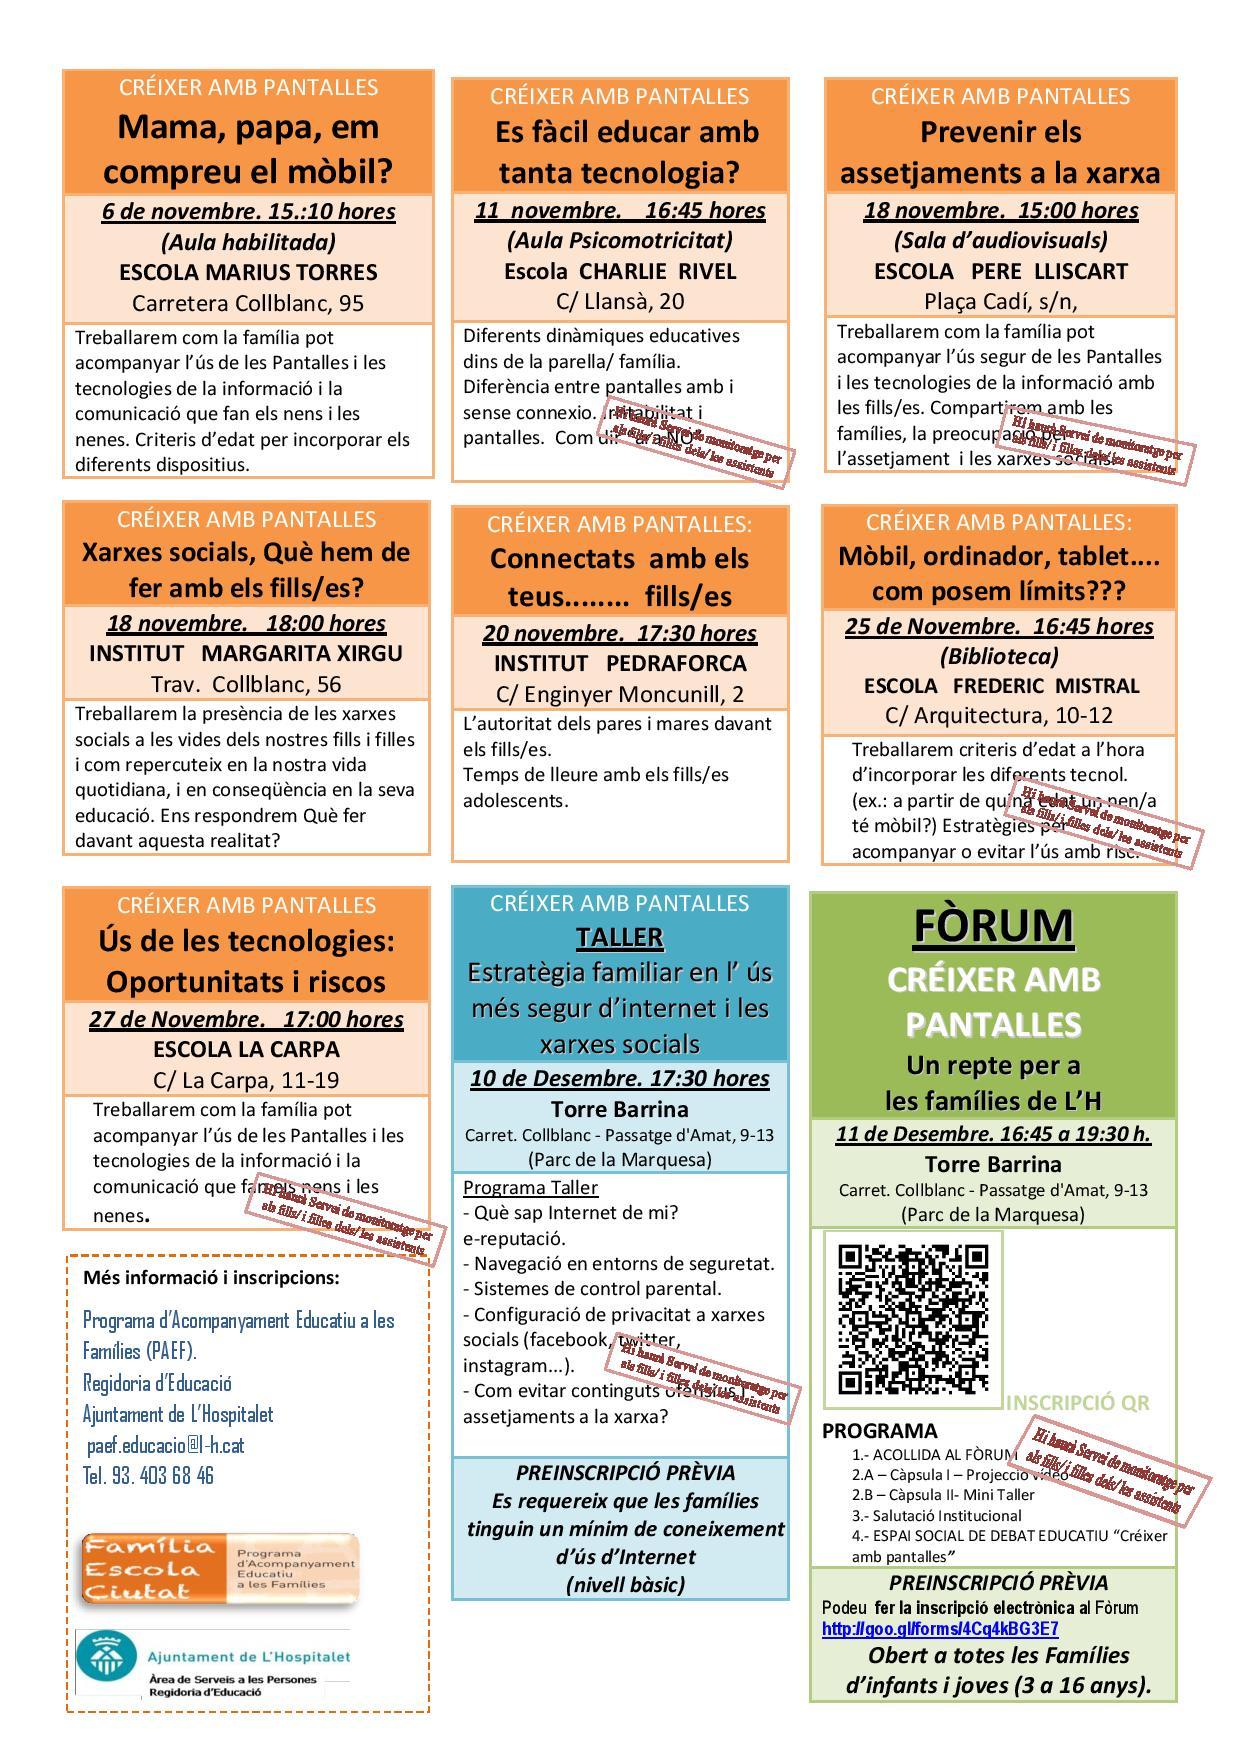 Catàleg-Poster-Créixer-pantalles-1-page-002